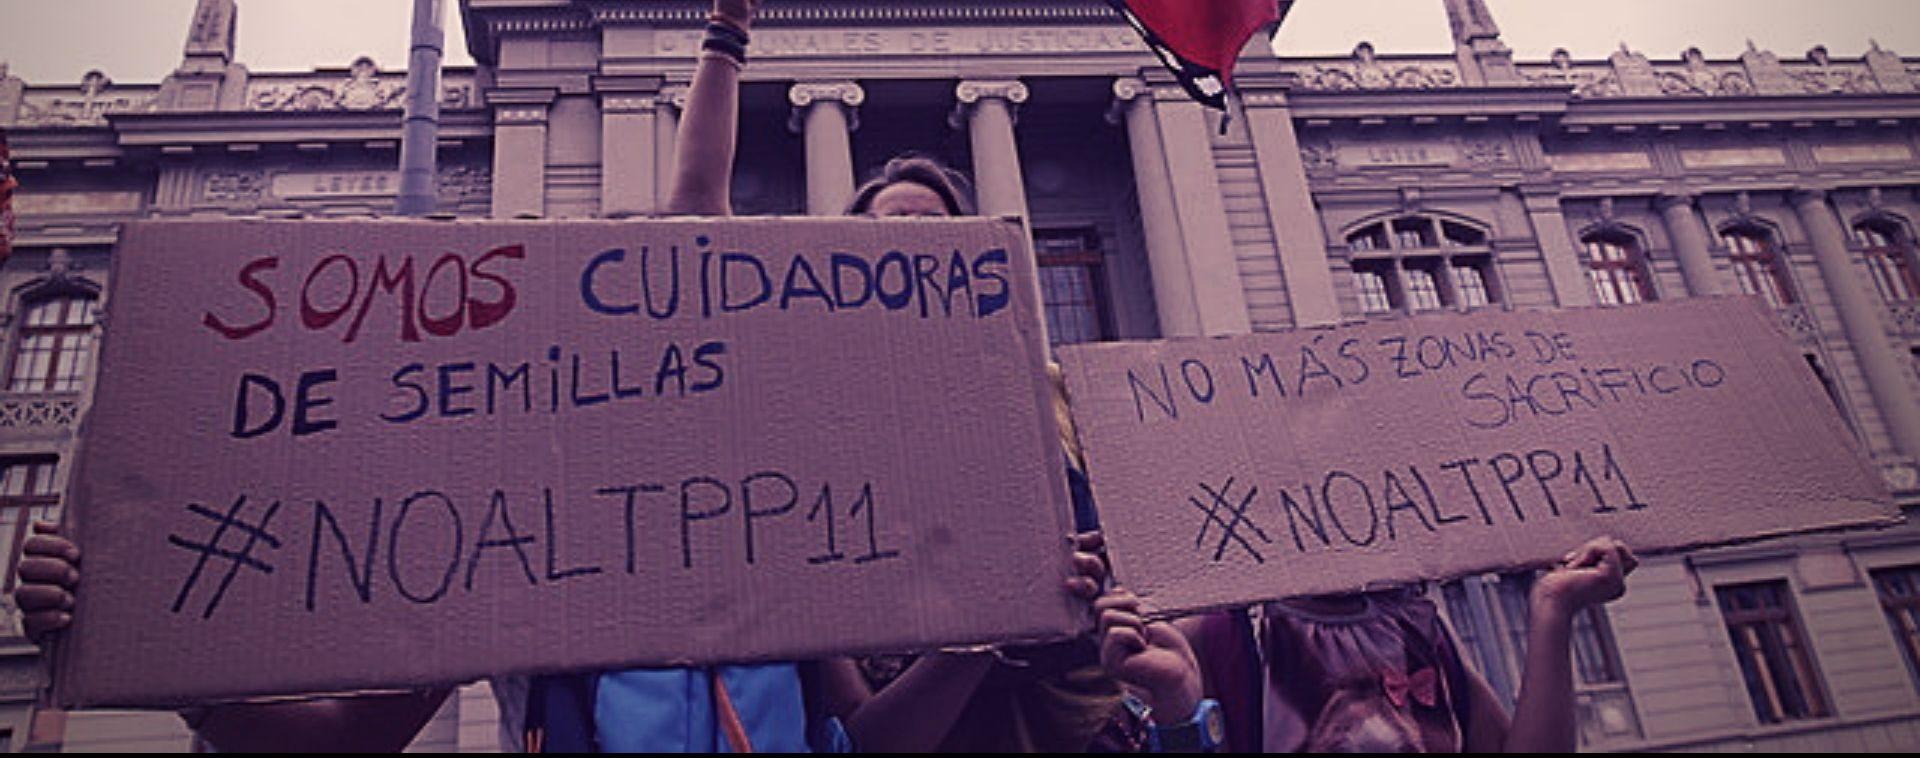 notpp tomate rojo agencia uno e1566789328117 80x80 - Piñera le pone suma urgencia al TPP 11 por cuarta vez y espera que se apruebe antes de fin de mes